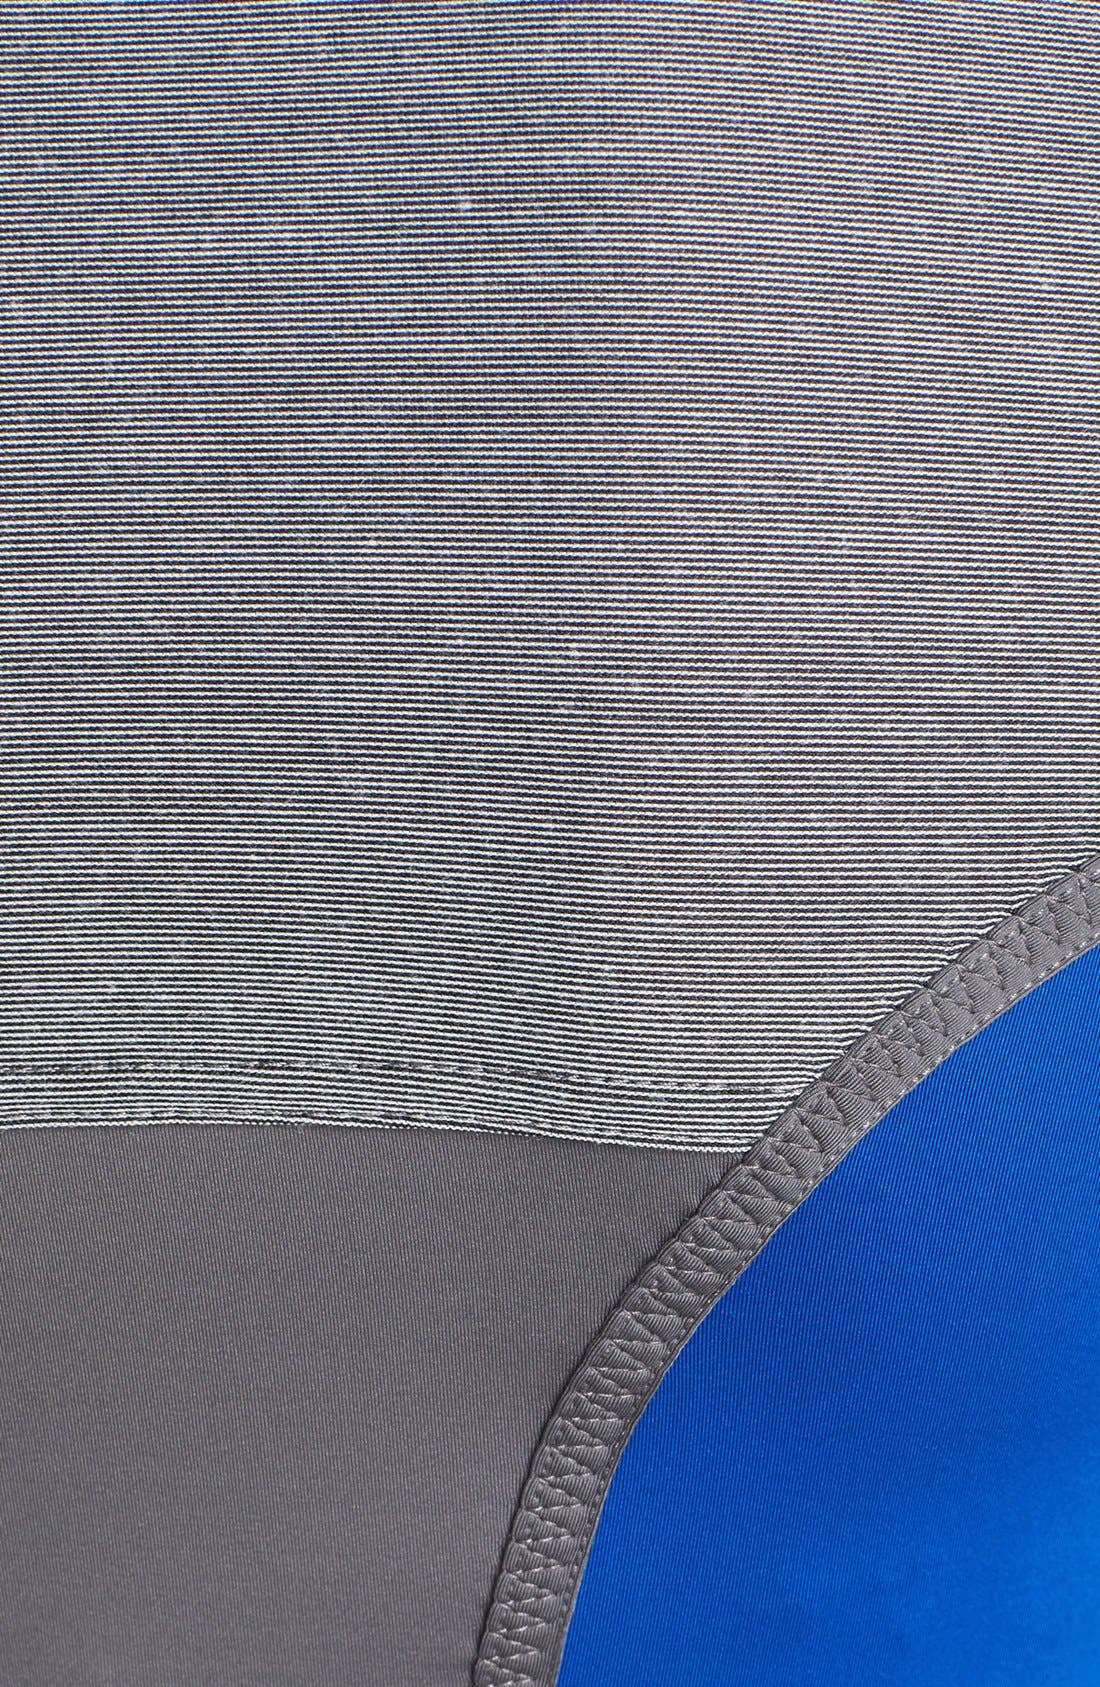 Alternate Image 3  - adidas by Stella McCartney 'Studio' Long Sleeve Tee